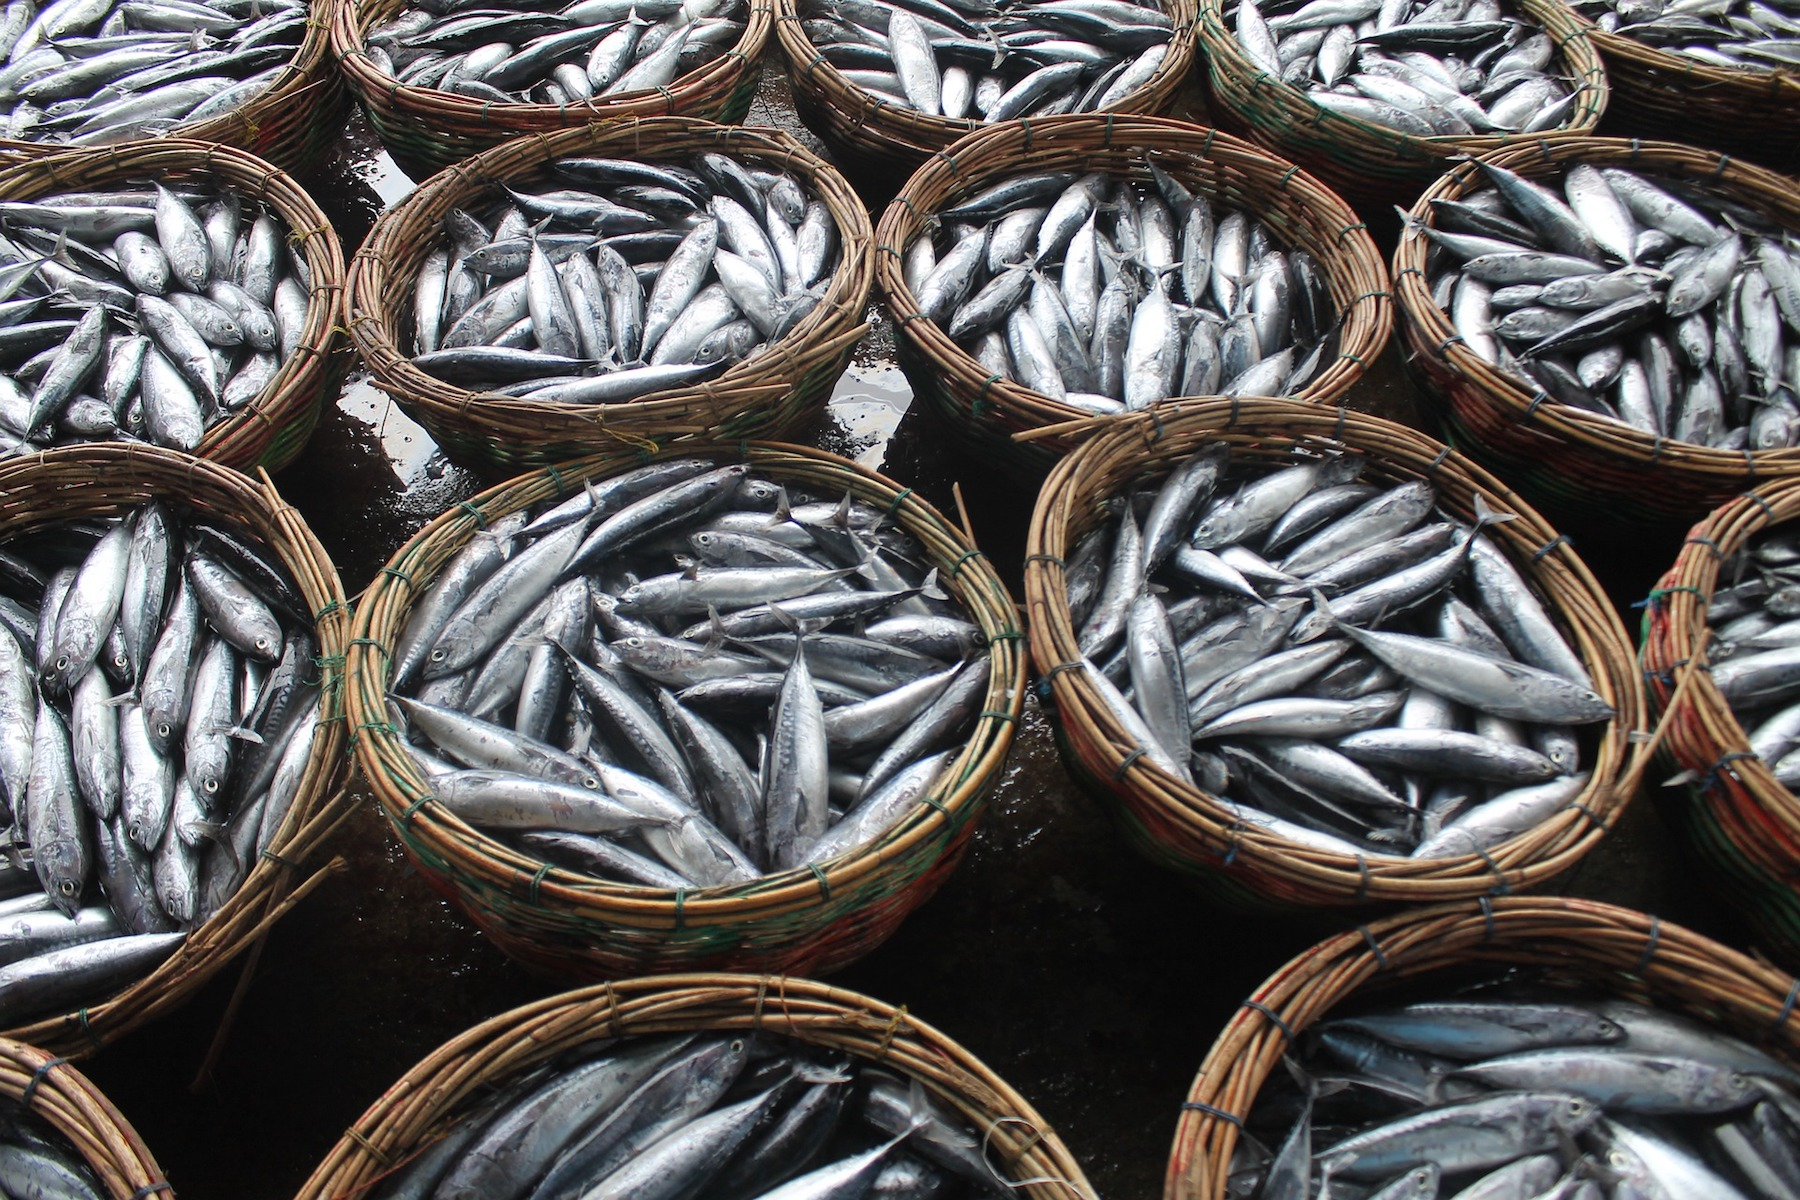 fish-5196682 1920